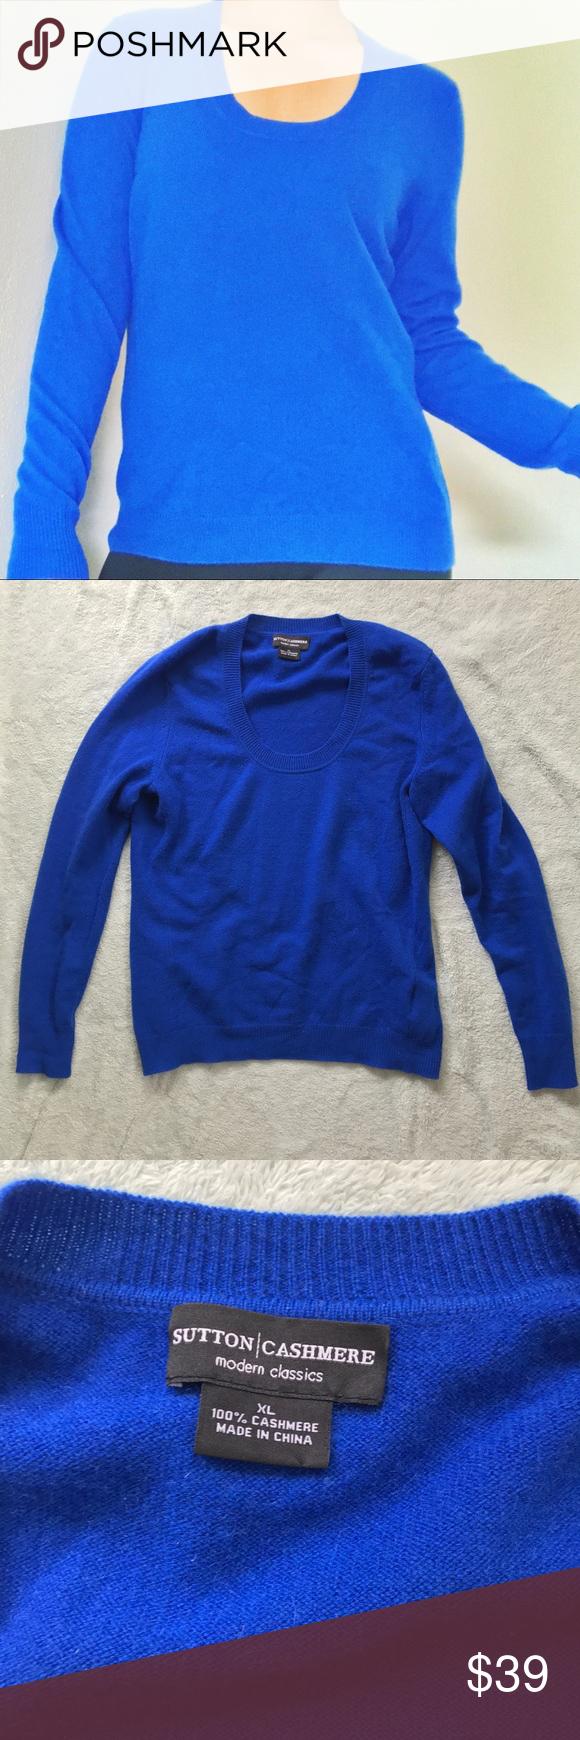 Royal blue n yellow dress  Sutton Cashmere Cobalt Blue Crewneck Sweater  Crewneck sweaters